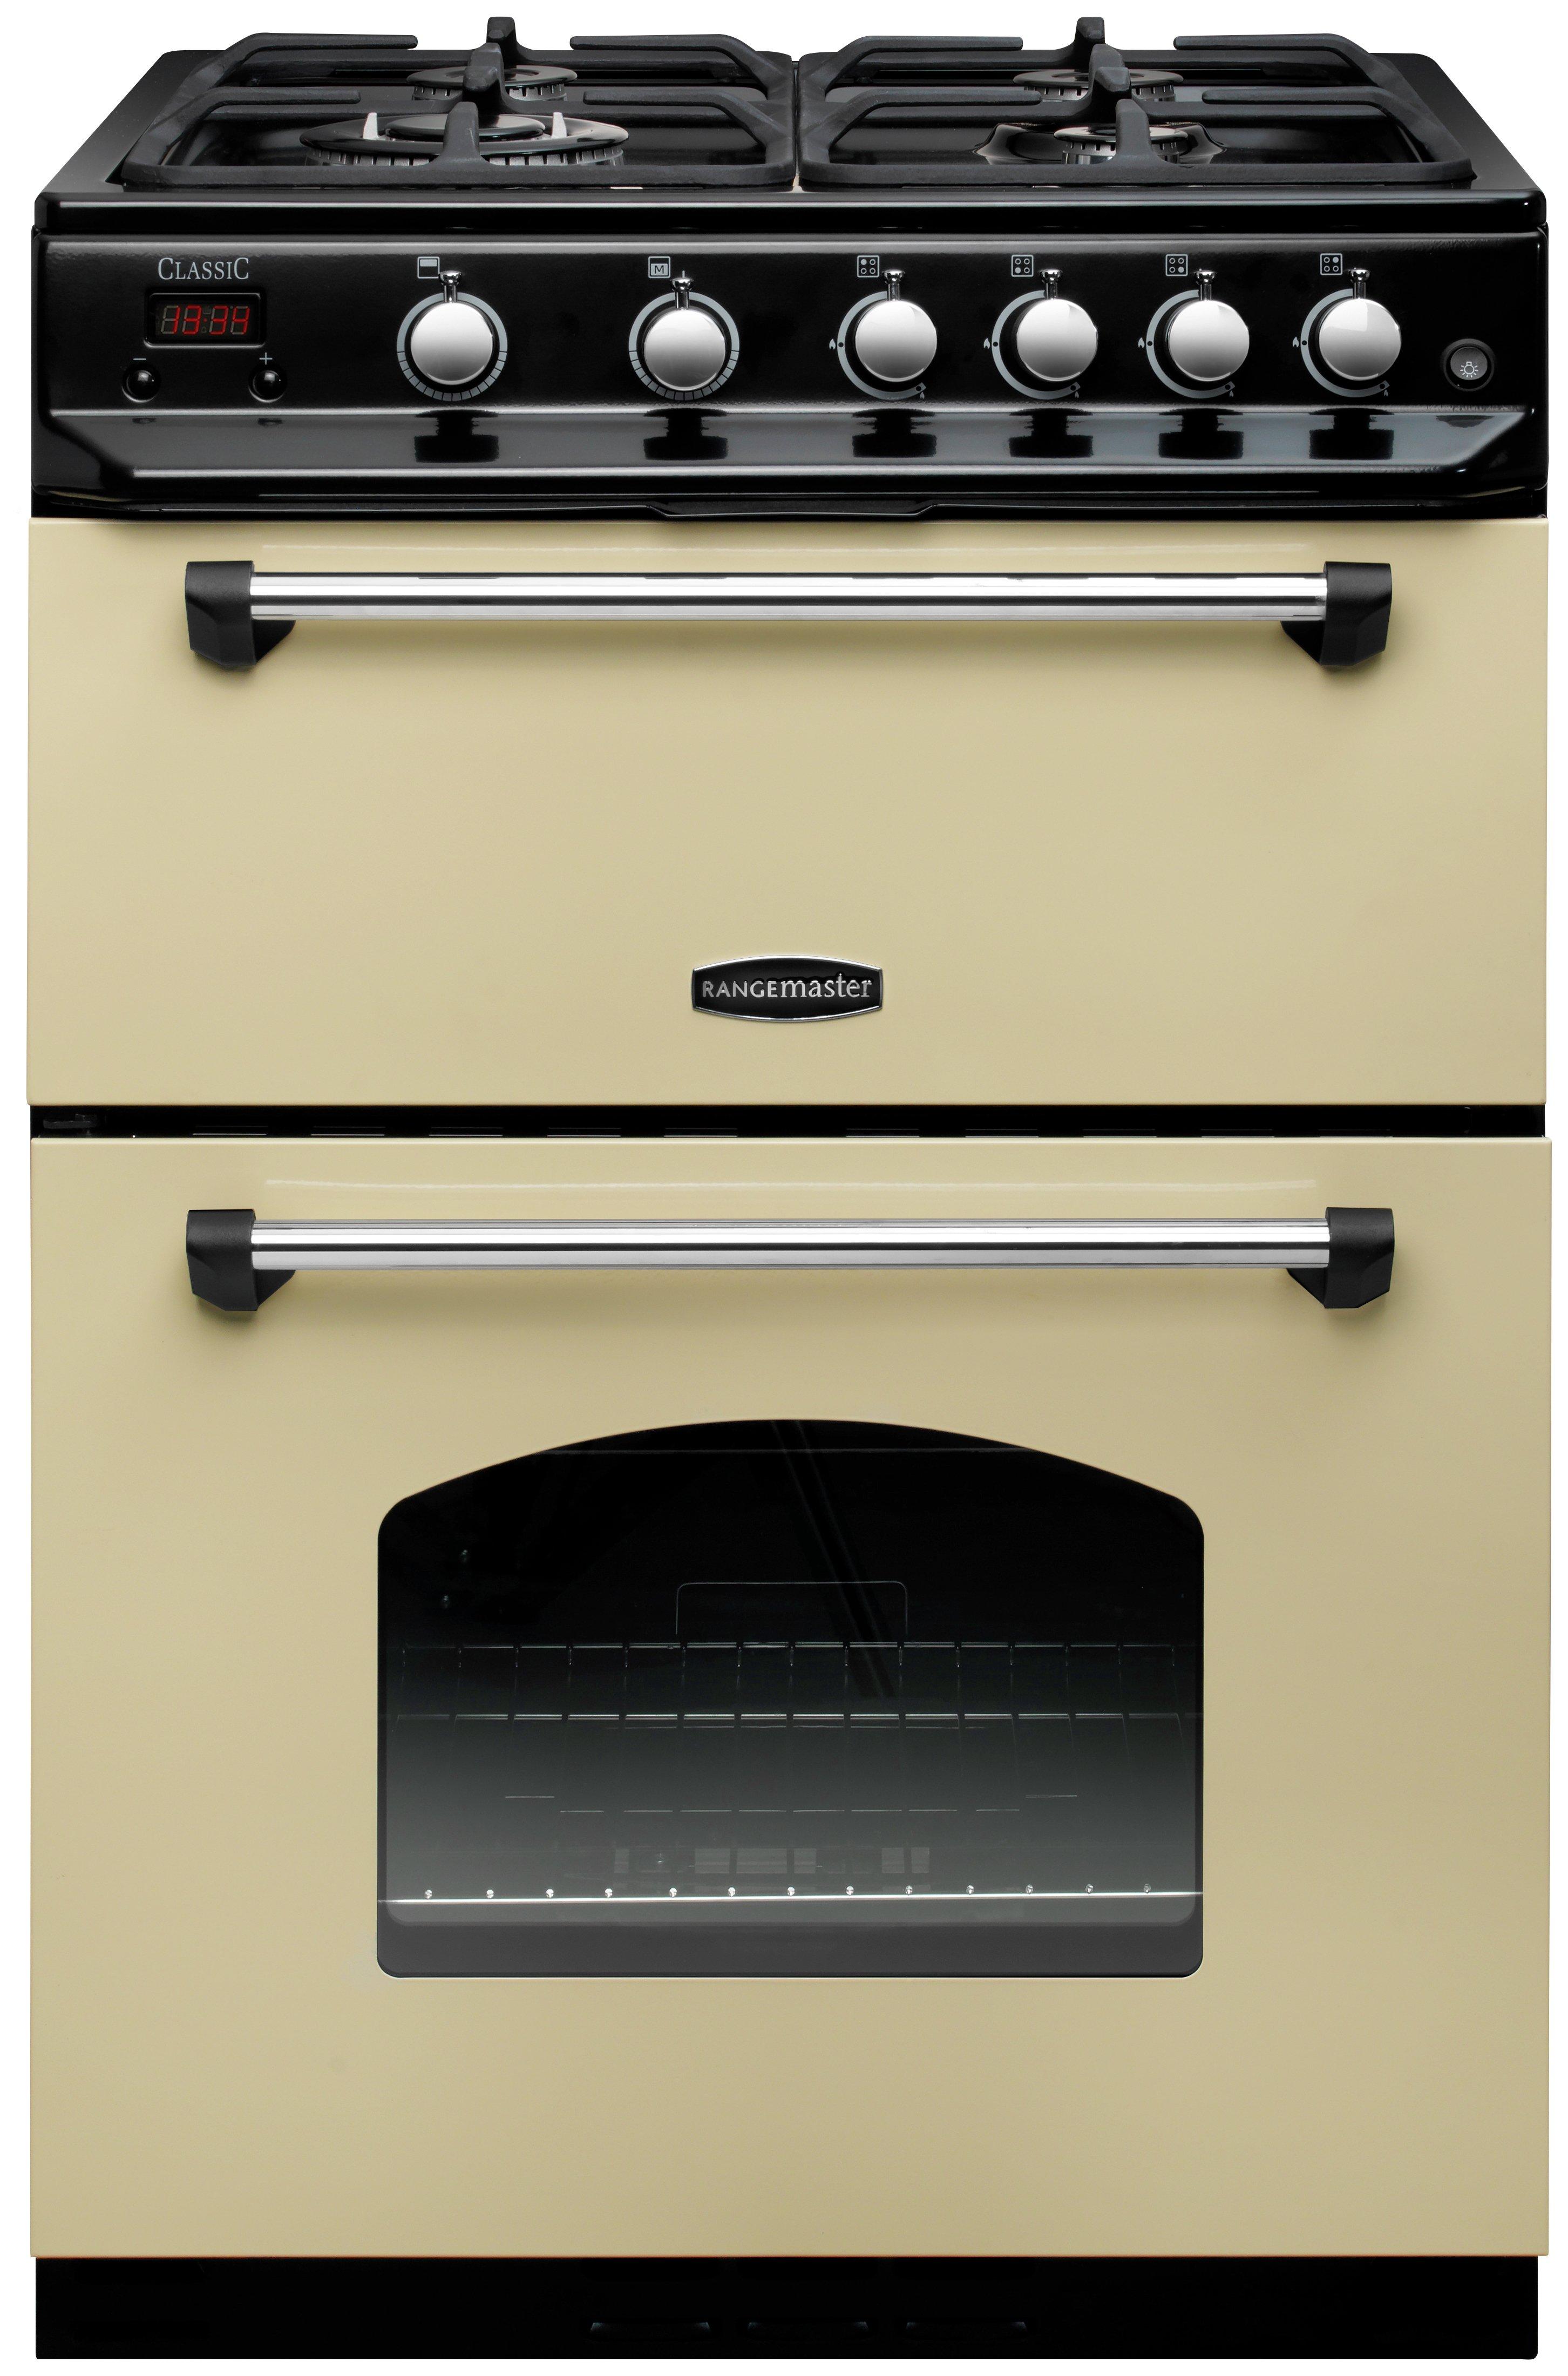 Rangemaster CLAS60NGFCR/C Classic Gas Cooker - Cream